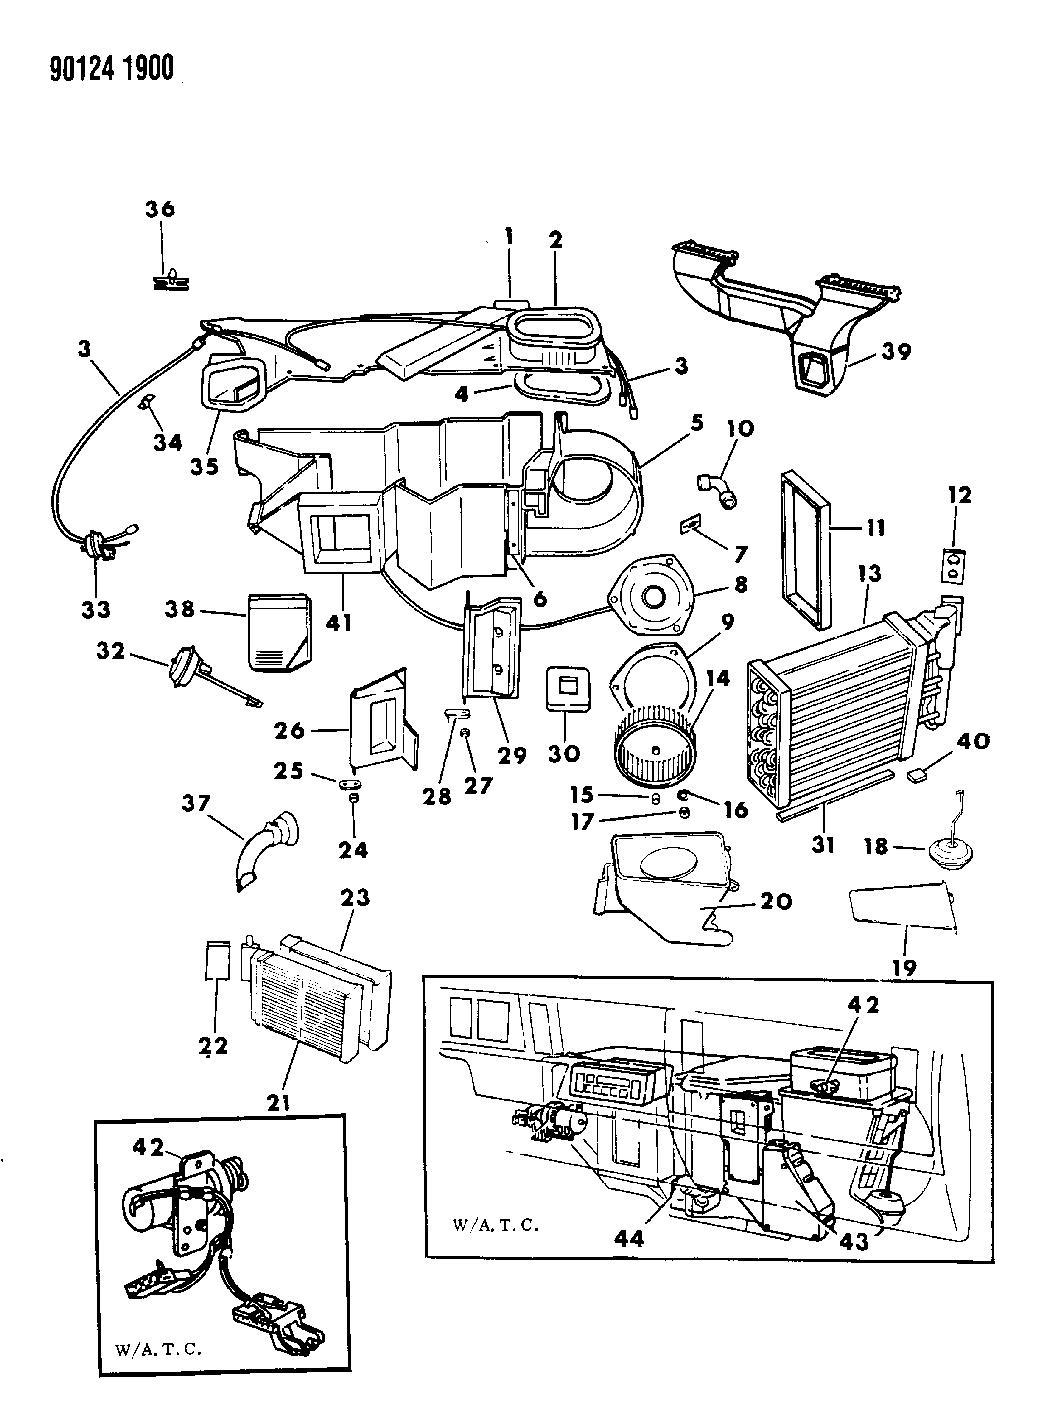 1990 Dodge Daytona Air Conditioning & Heater Unit